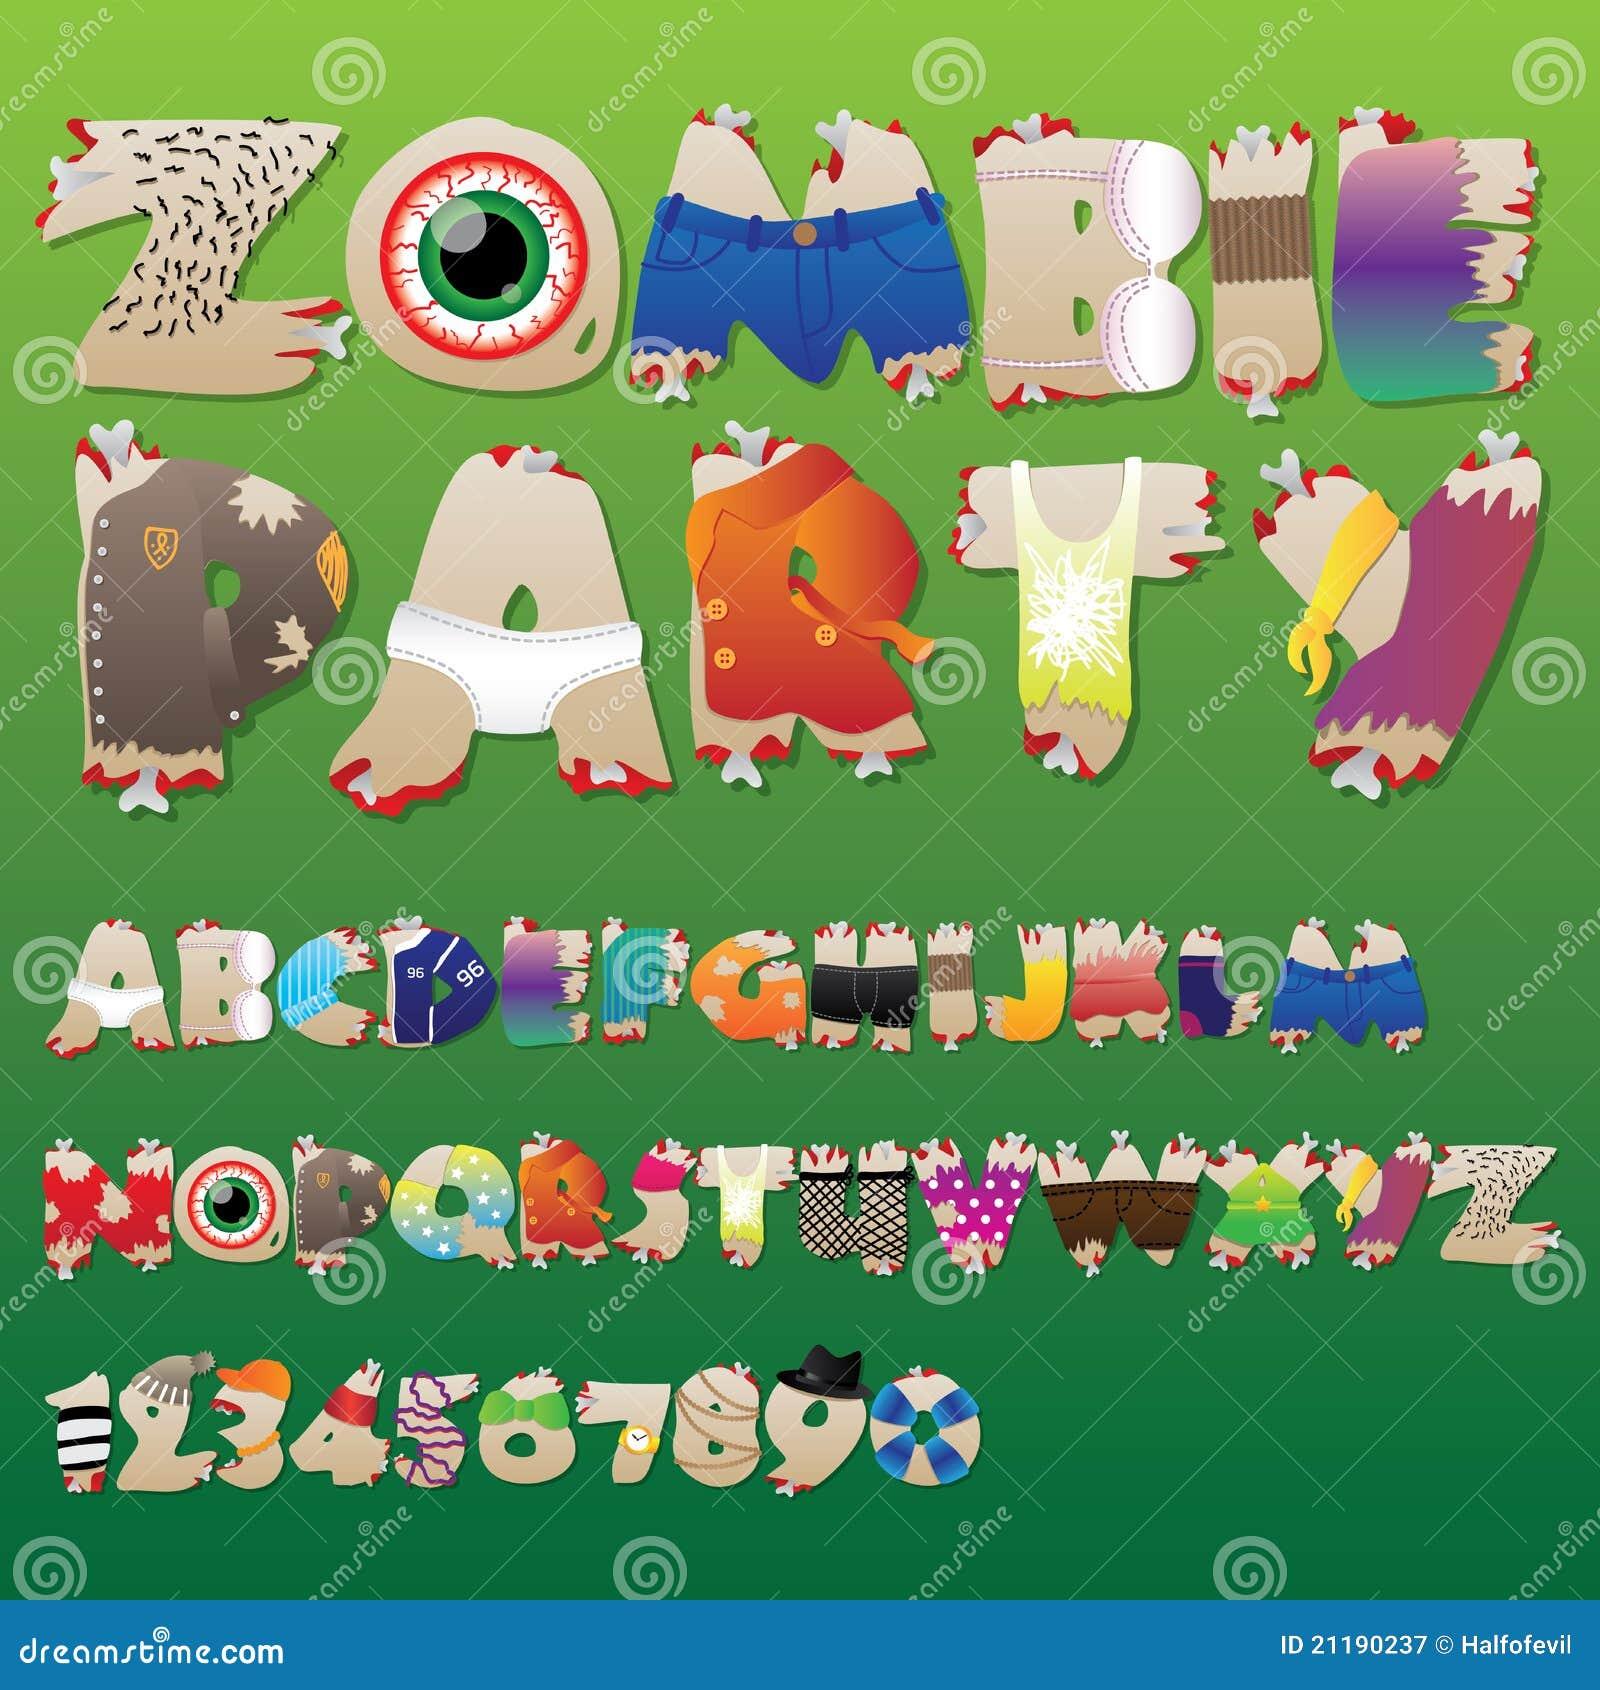 Zombie party font